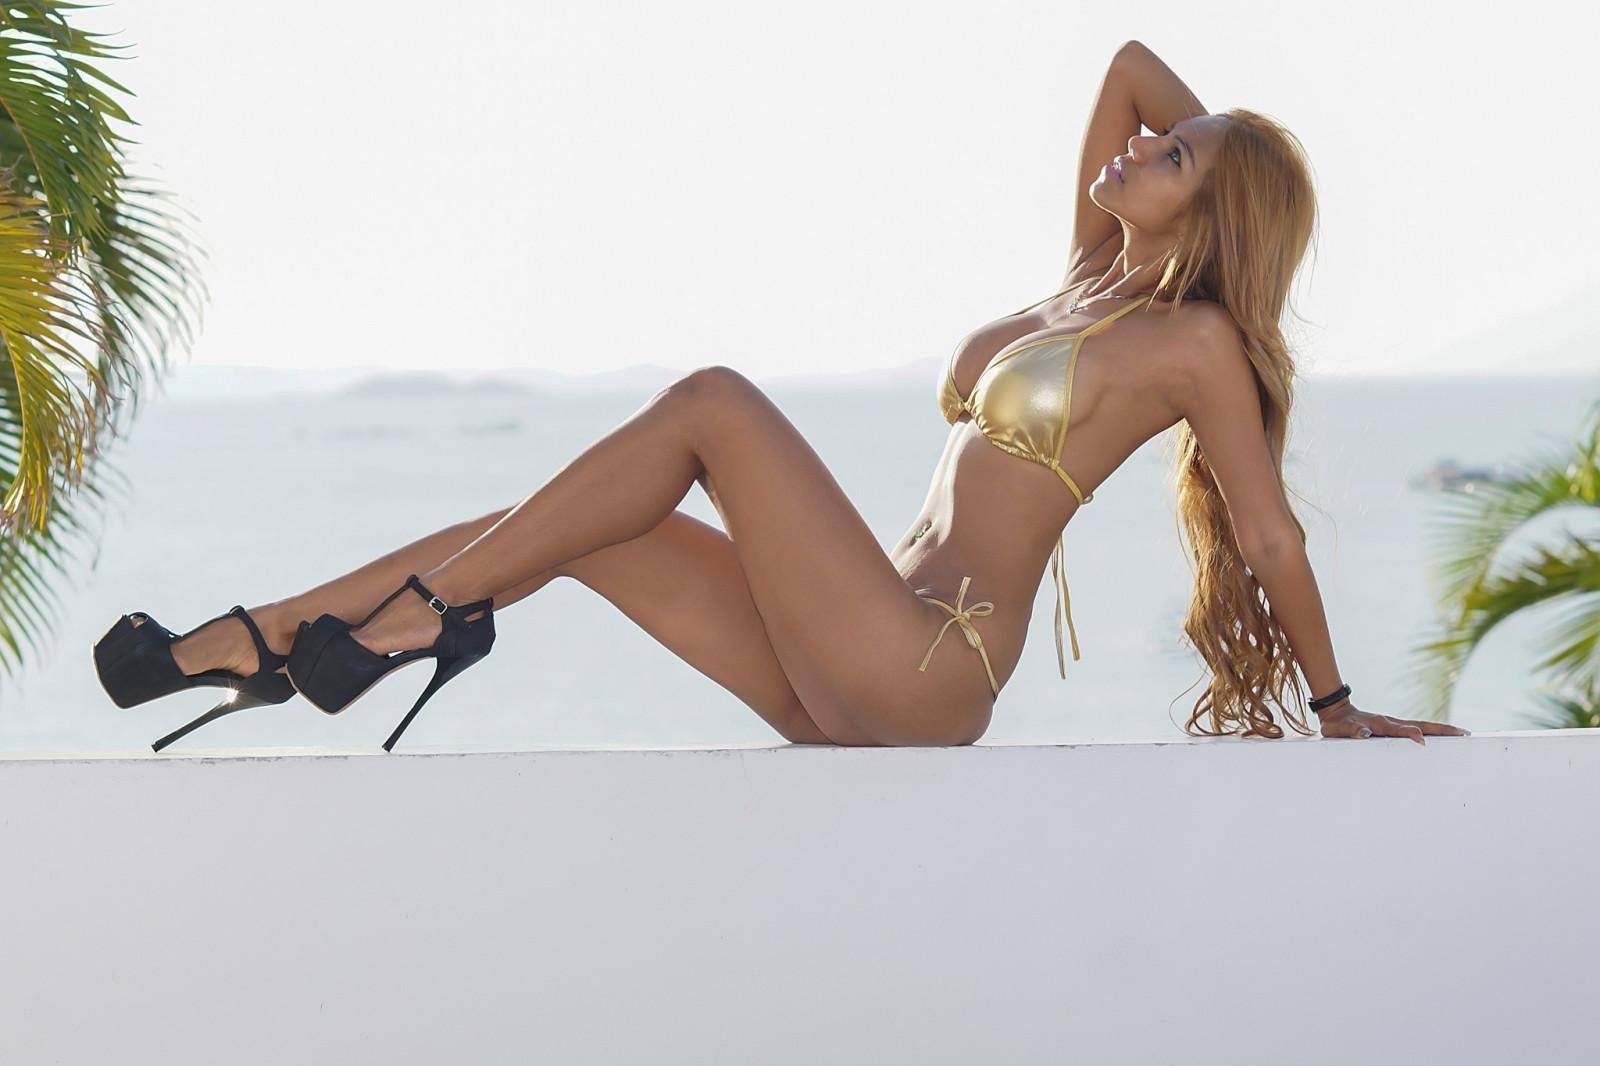 black-woman-girls-in-bikinis-and-high-heels-porn-sex